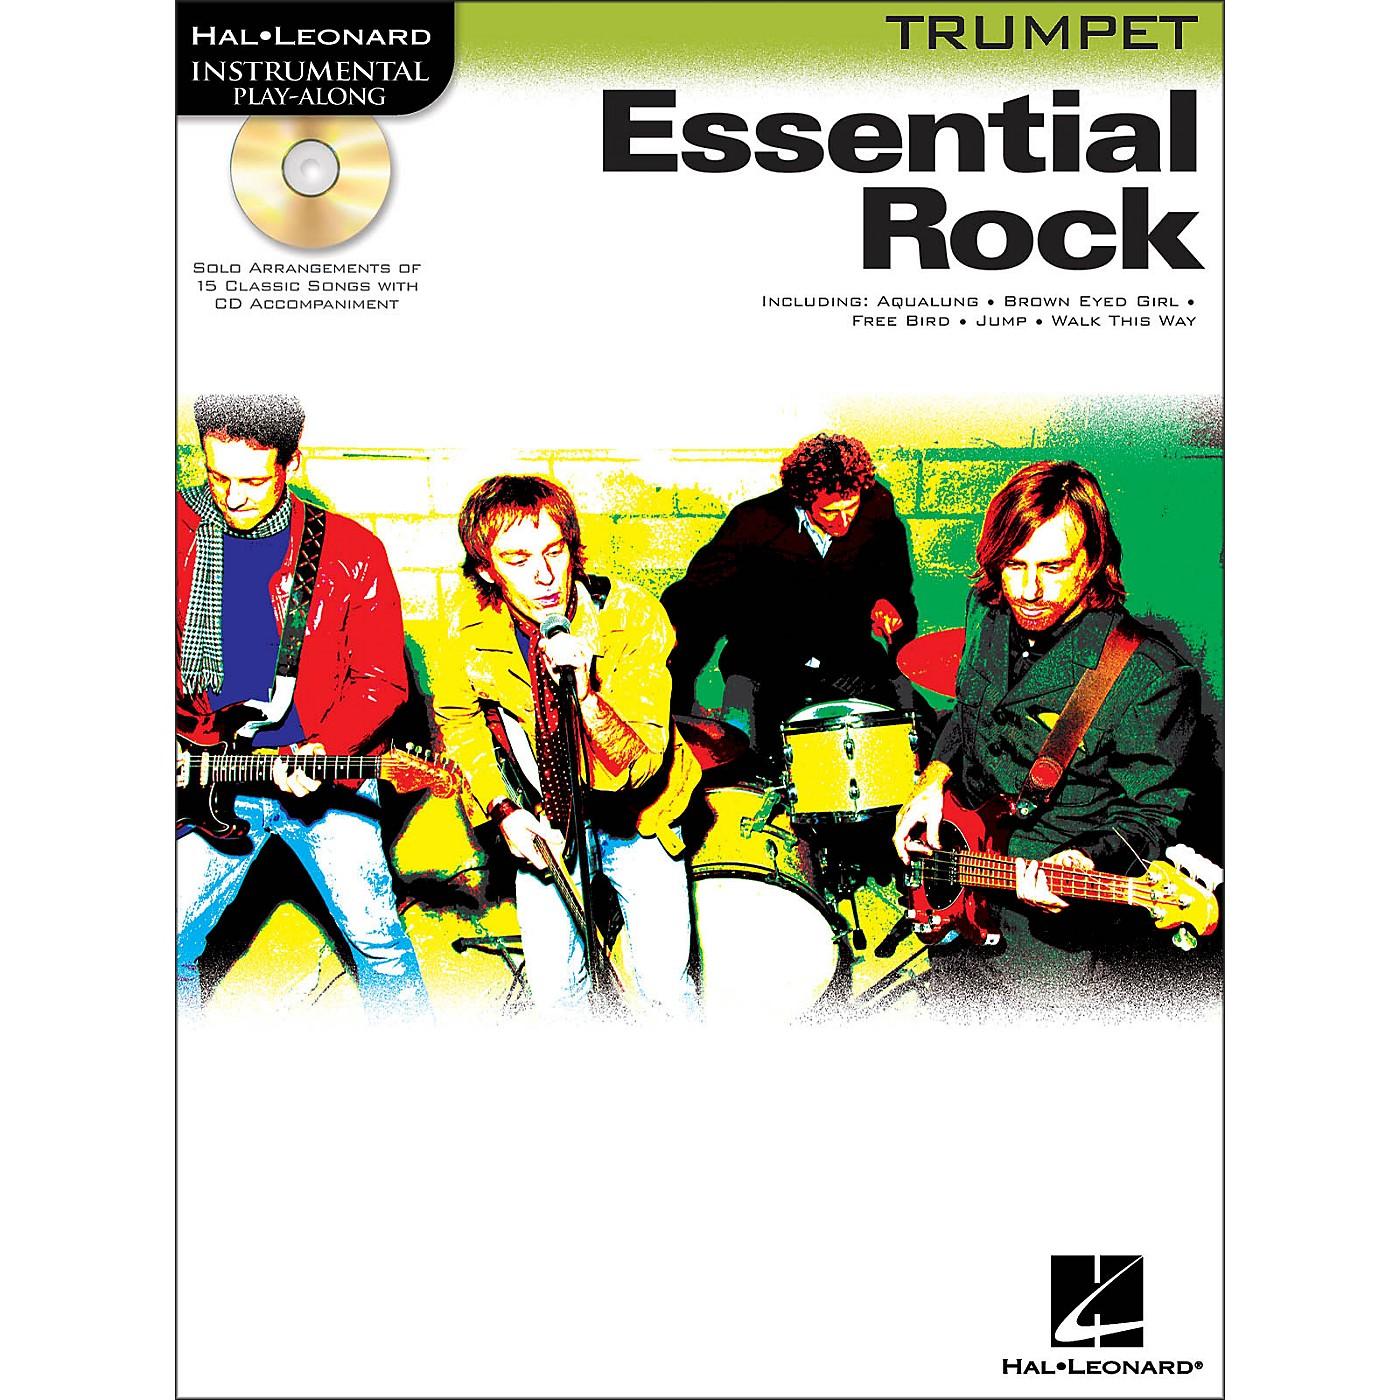 Hal Leonard Essential Rock for Trumpet Book/CD Instrumental Play-Along thumbnail